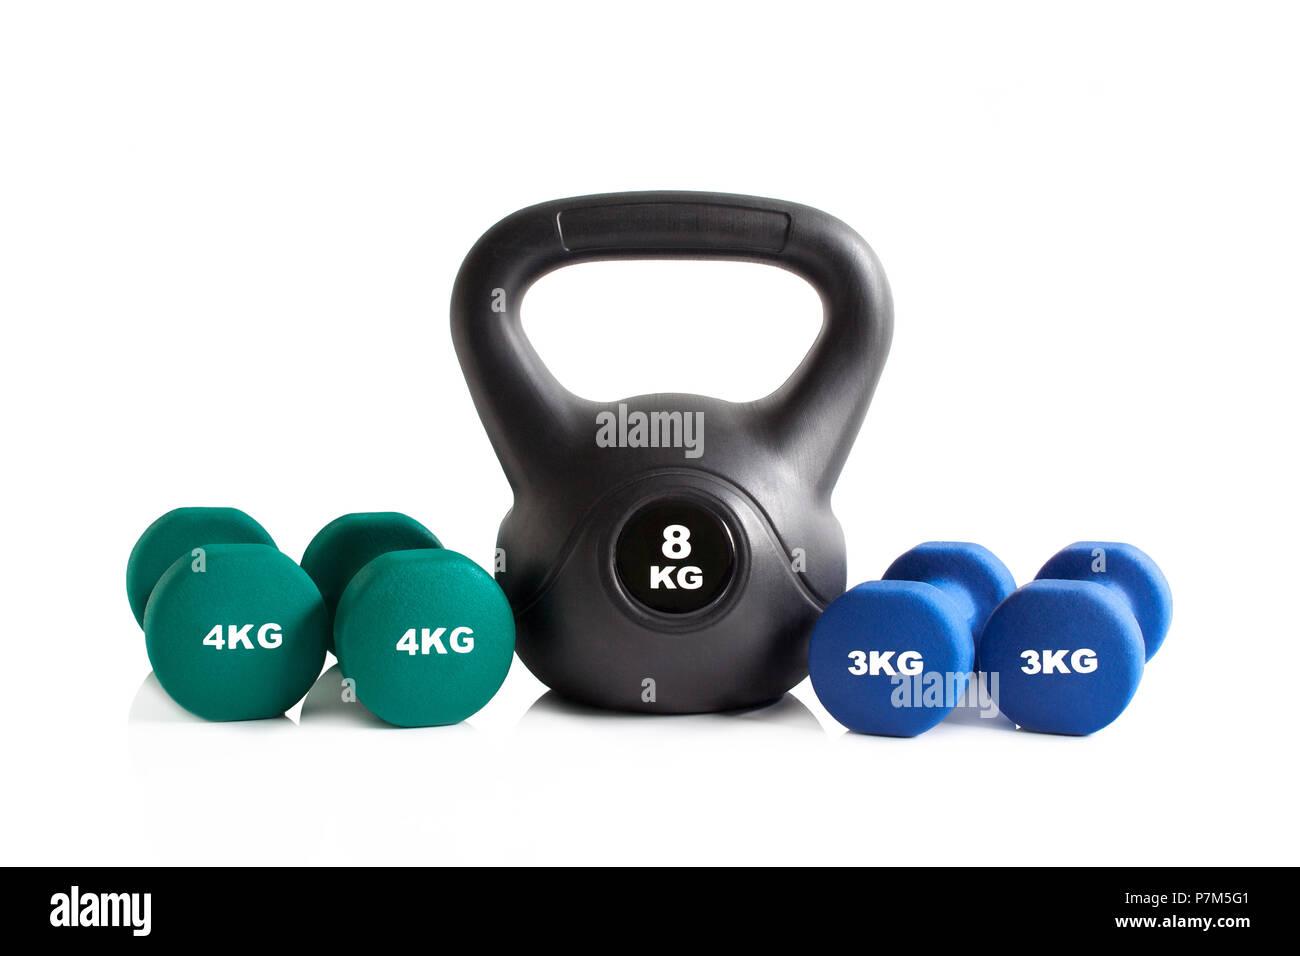 Gym exercise equipment set isolated on a white background. - Stock Image